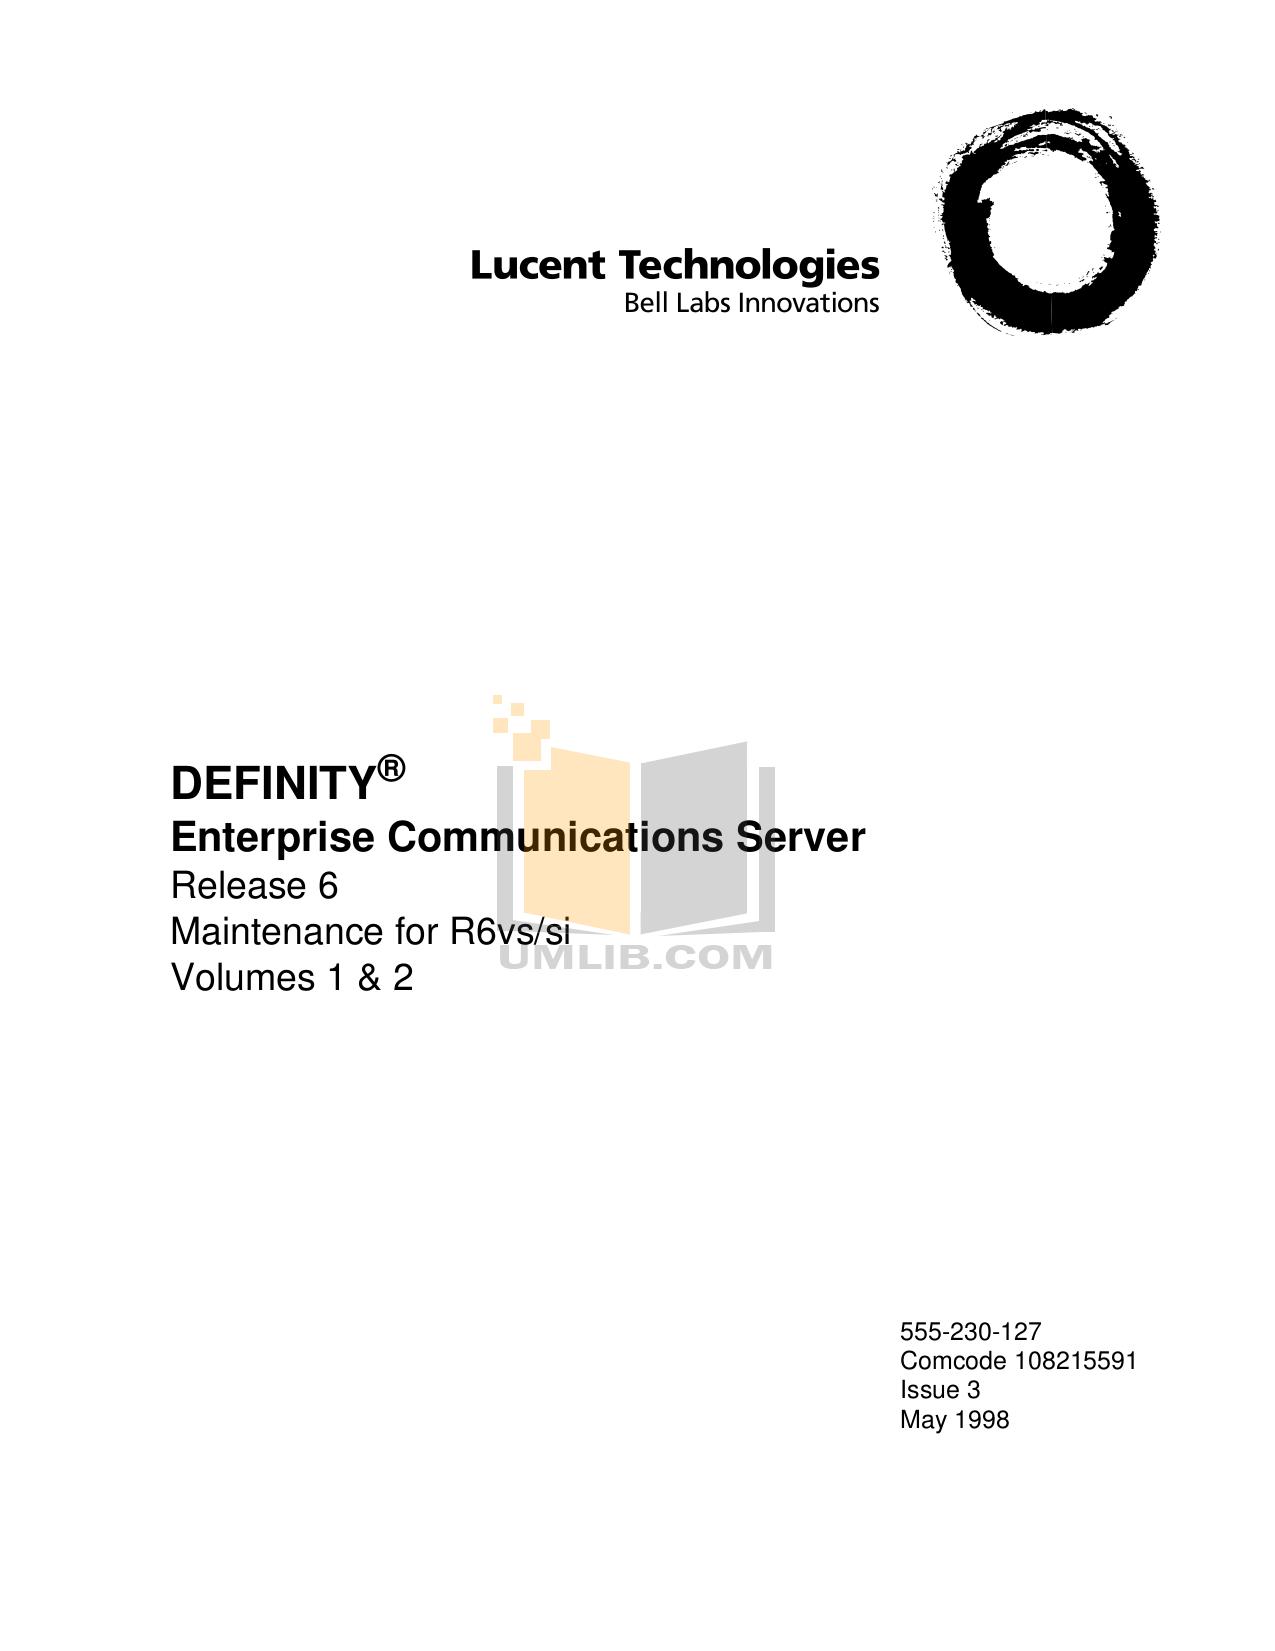 pdf for Avaya Telephone Definity Callmaster IV manual